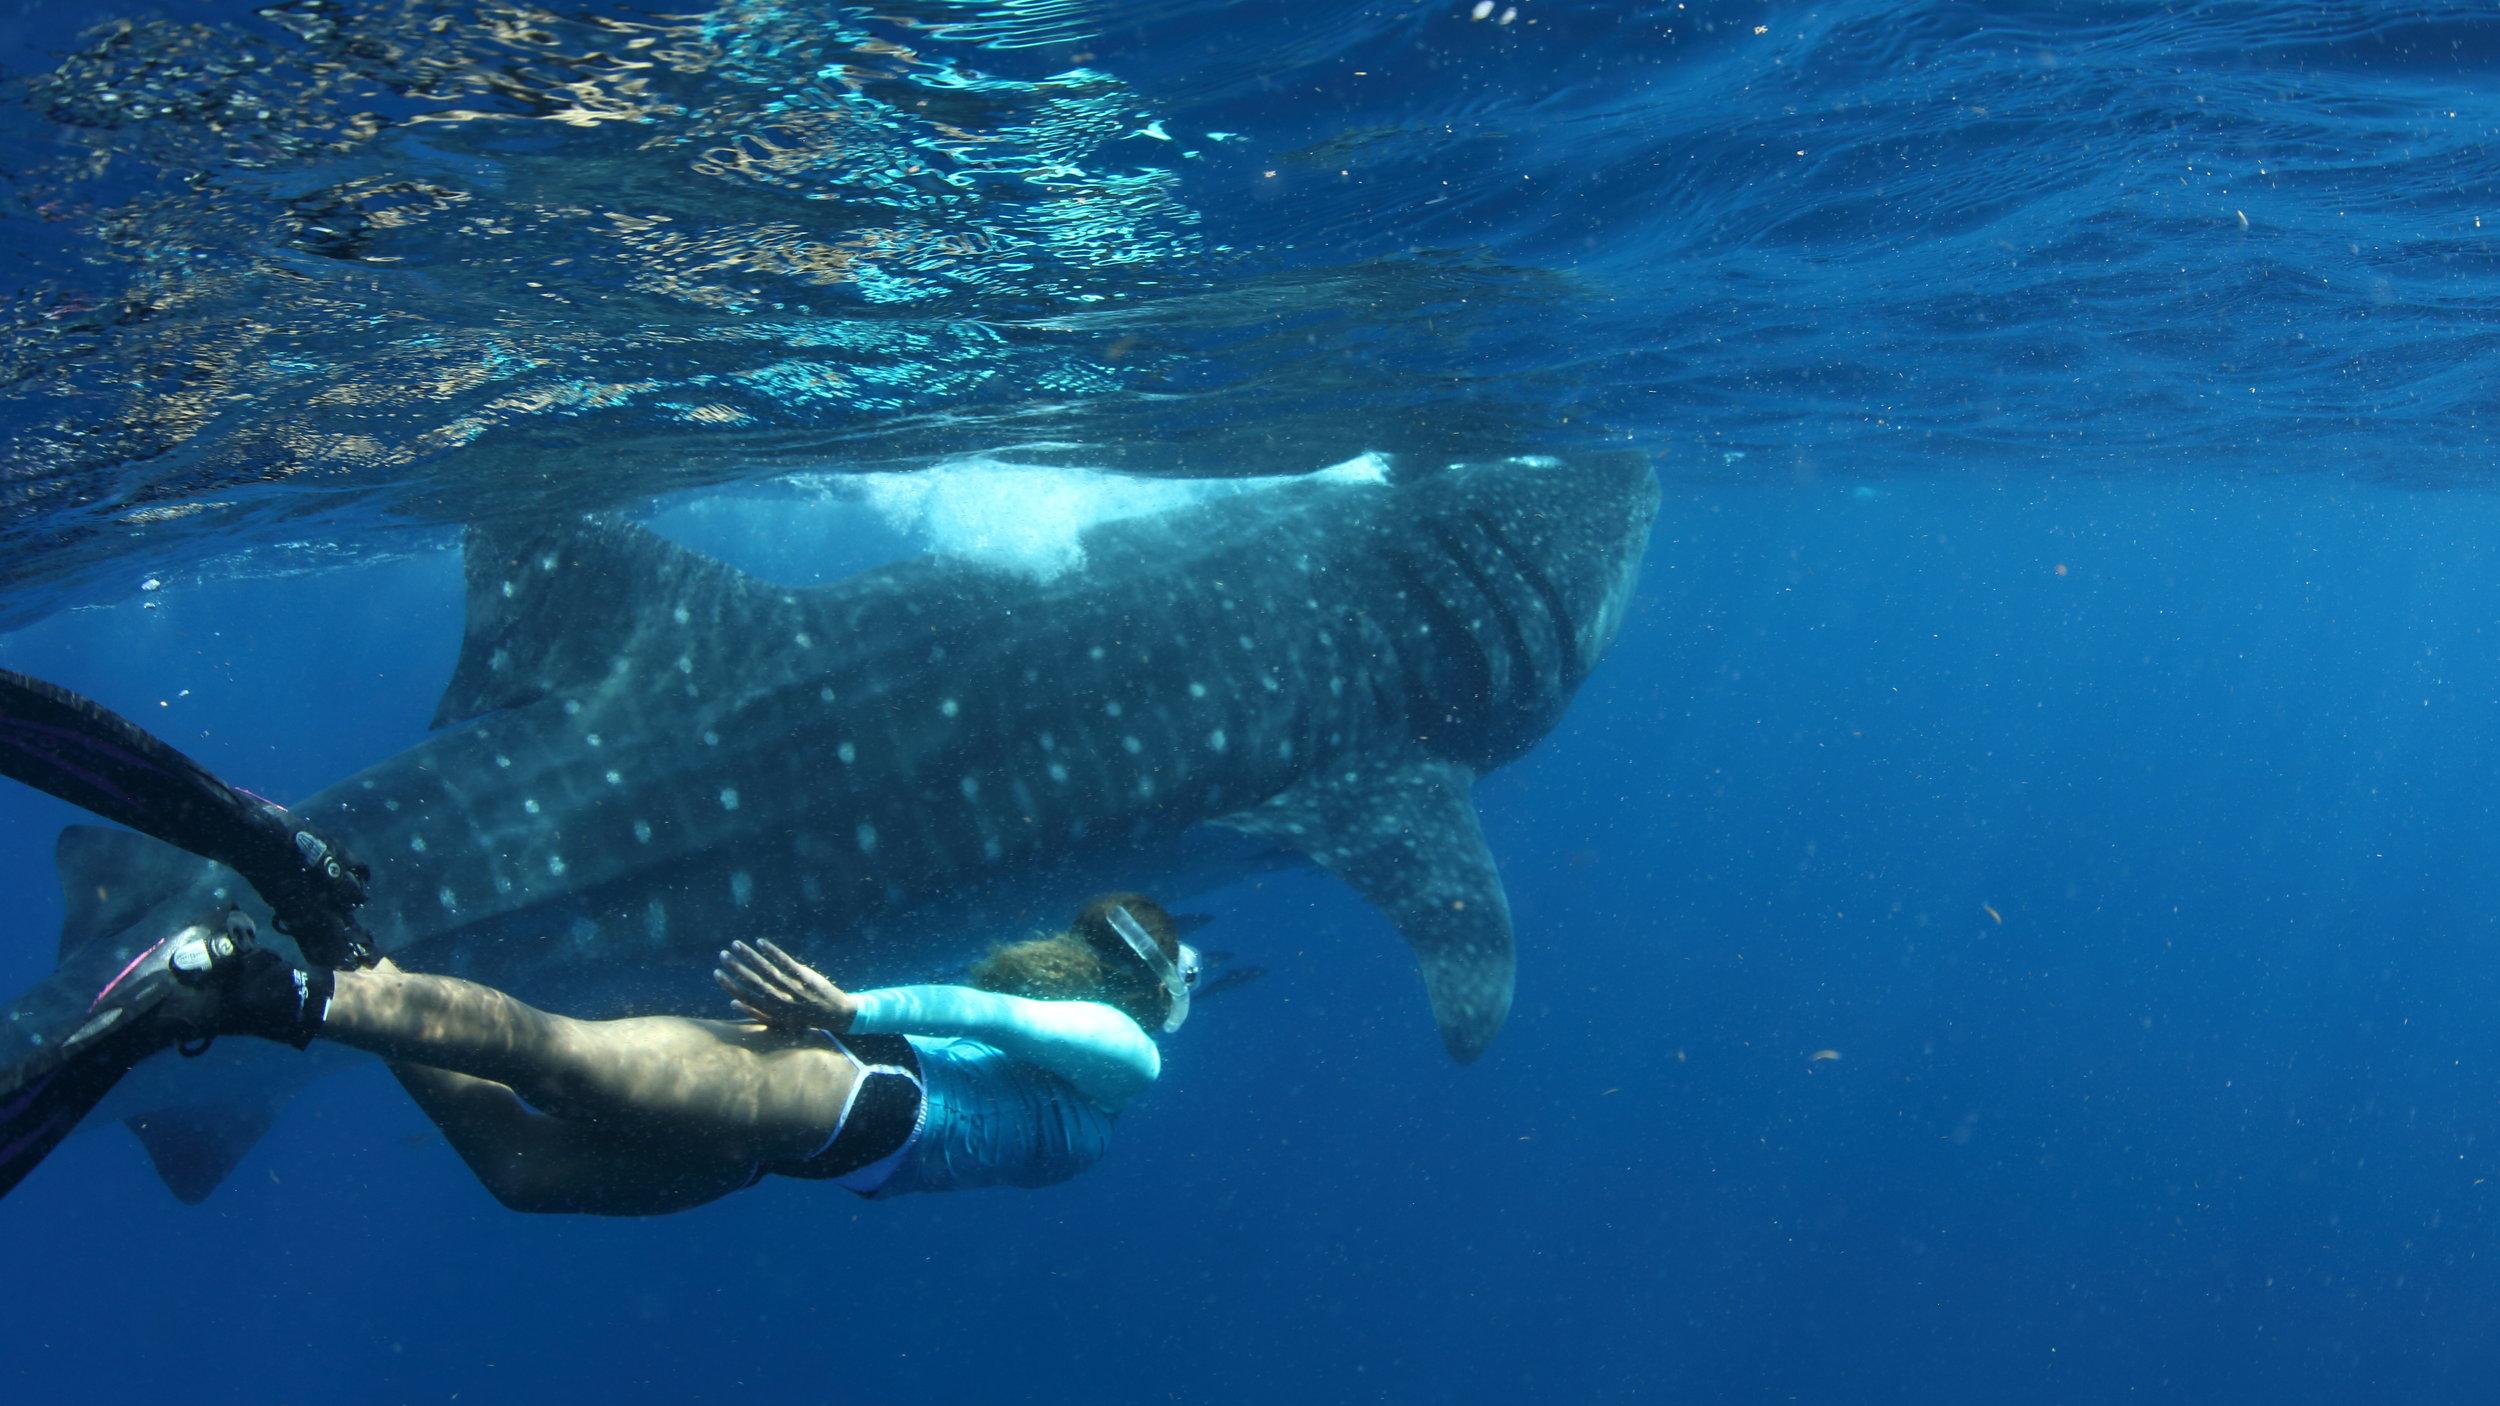 Danni_swims near WS.JPG